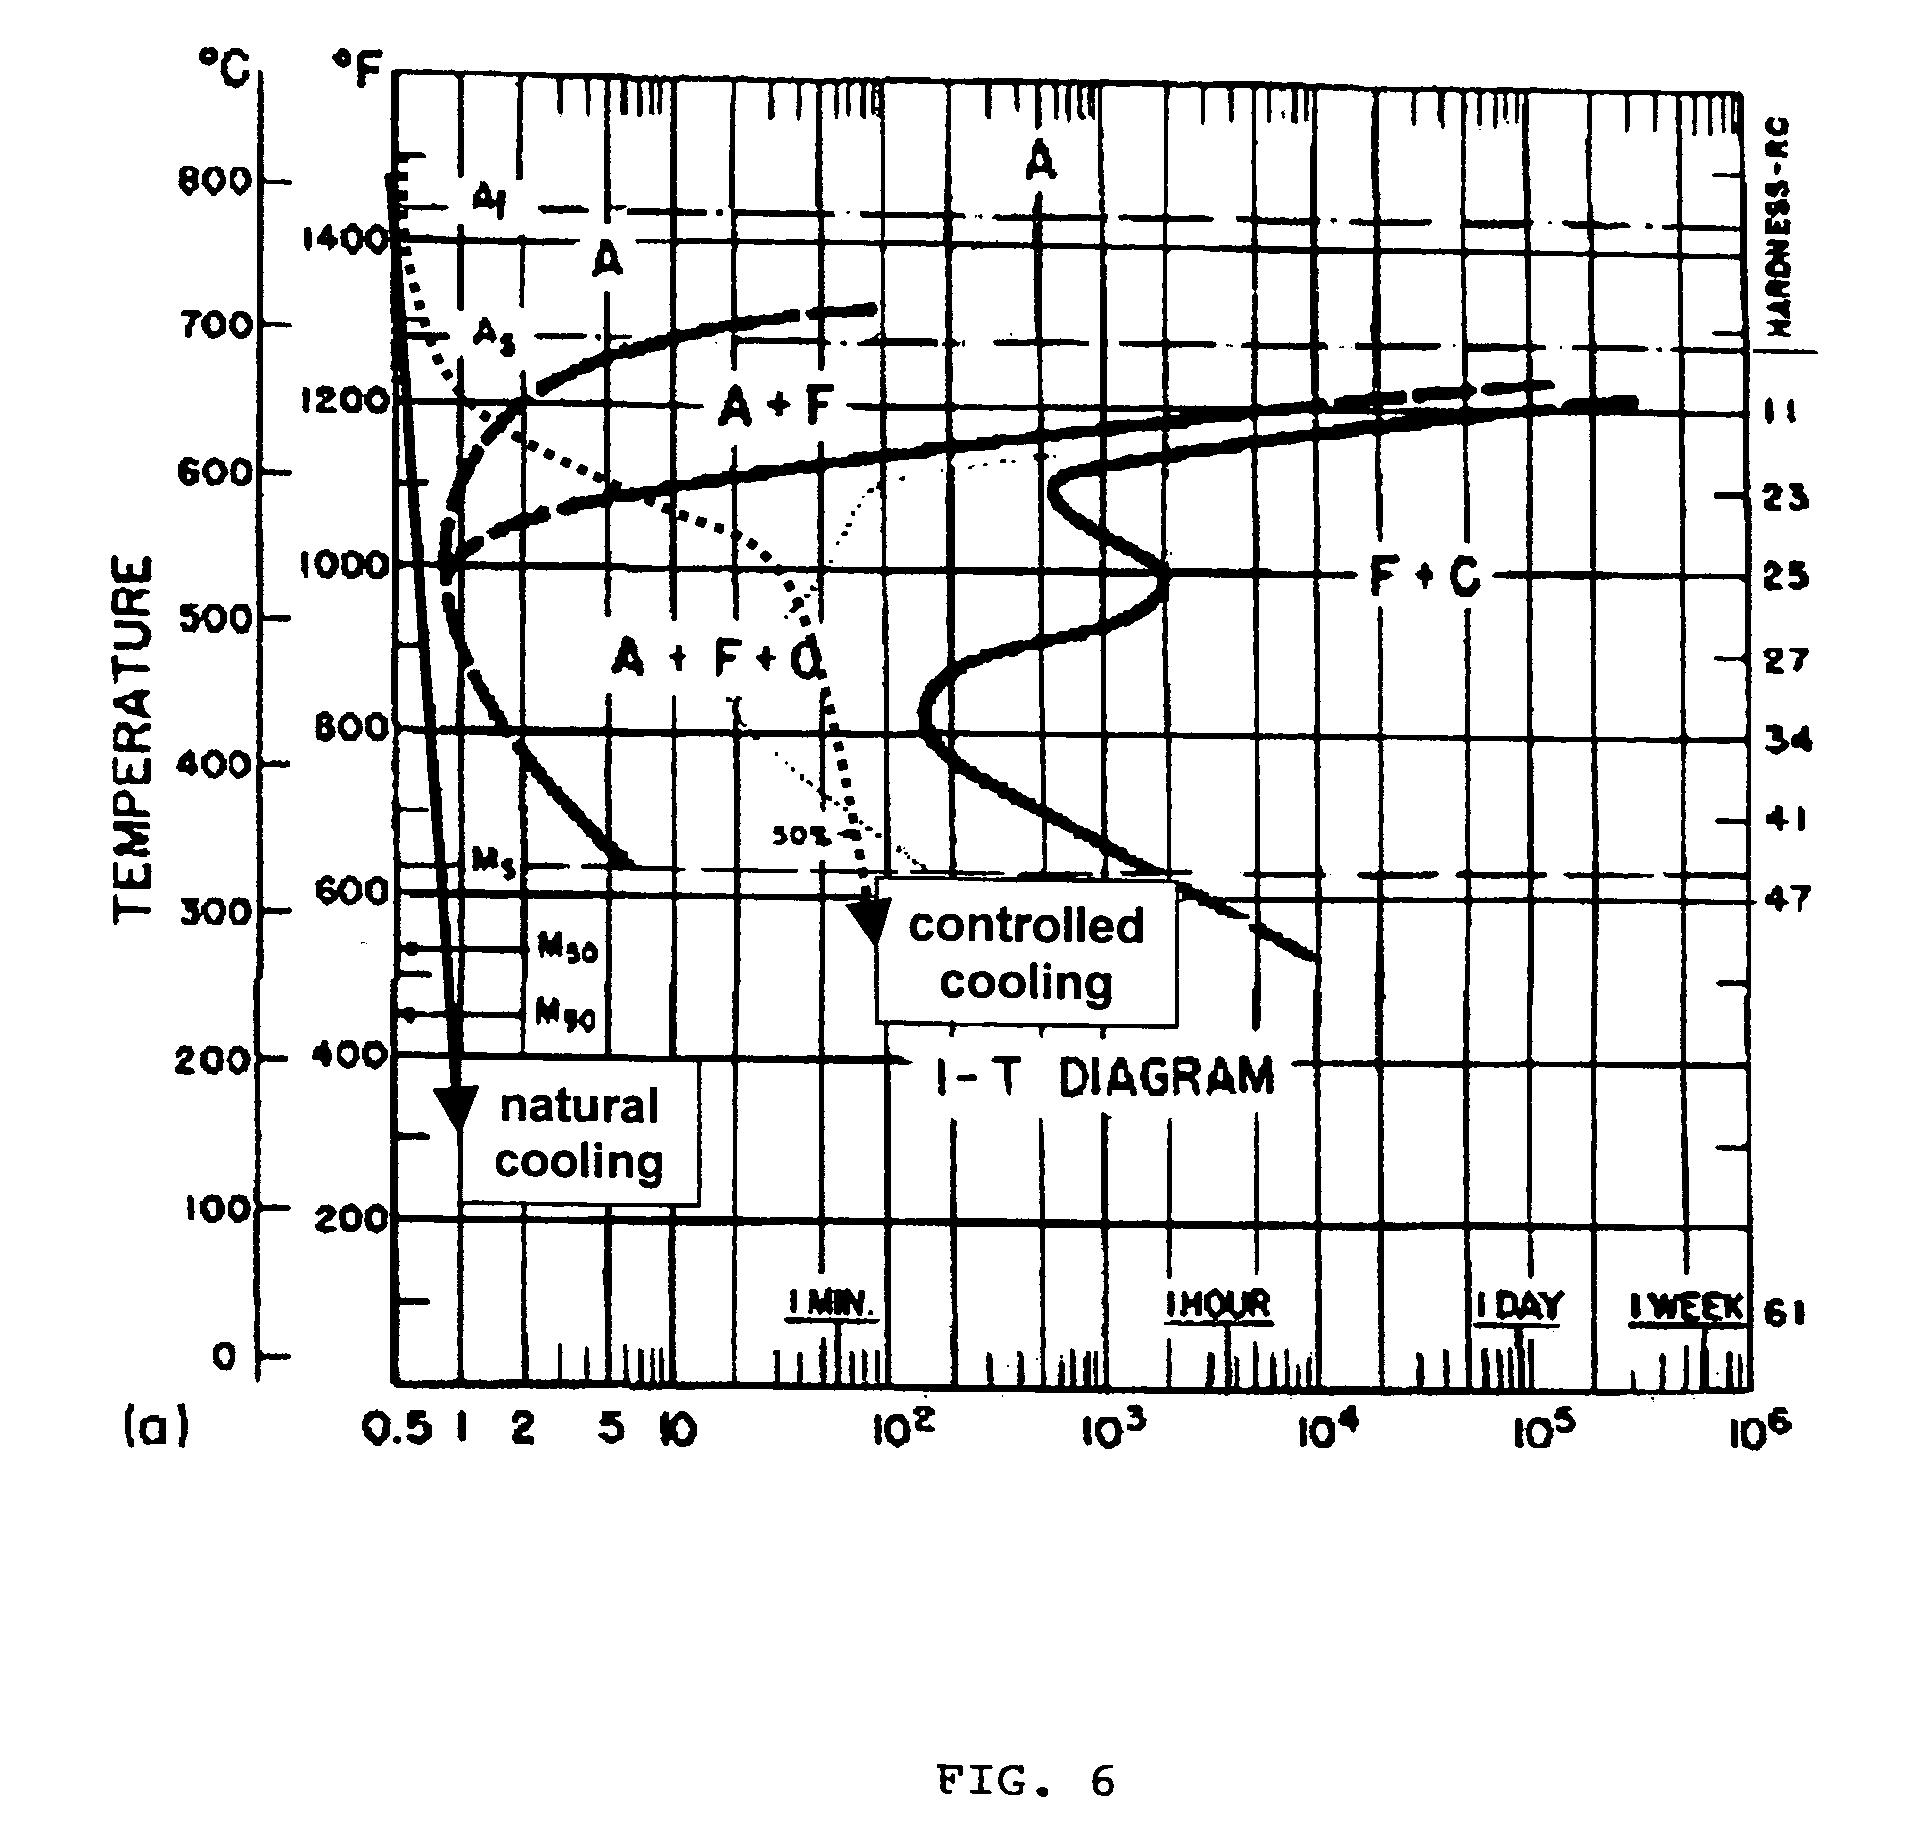 Welding Cct Diagram Auto Electrical Wiring Underglow Xs650 Chopper Car Toyota Hilux 1990 Oldsmobile 88 Fuse Box